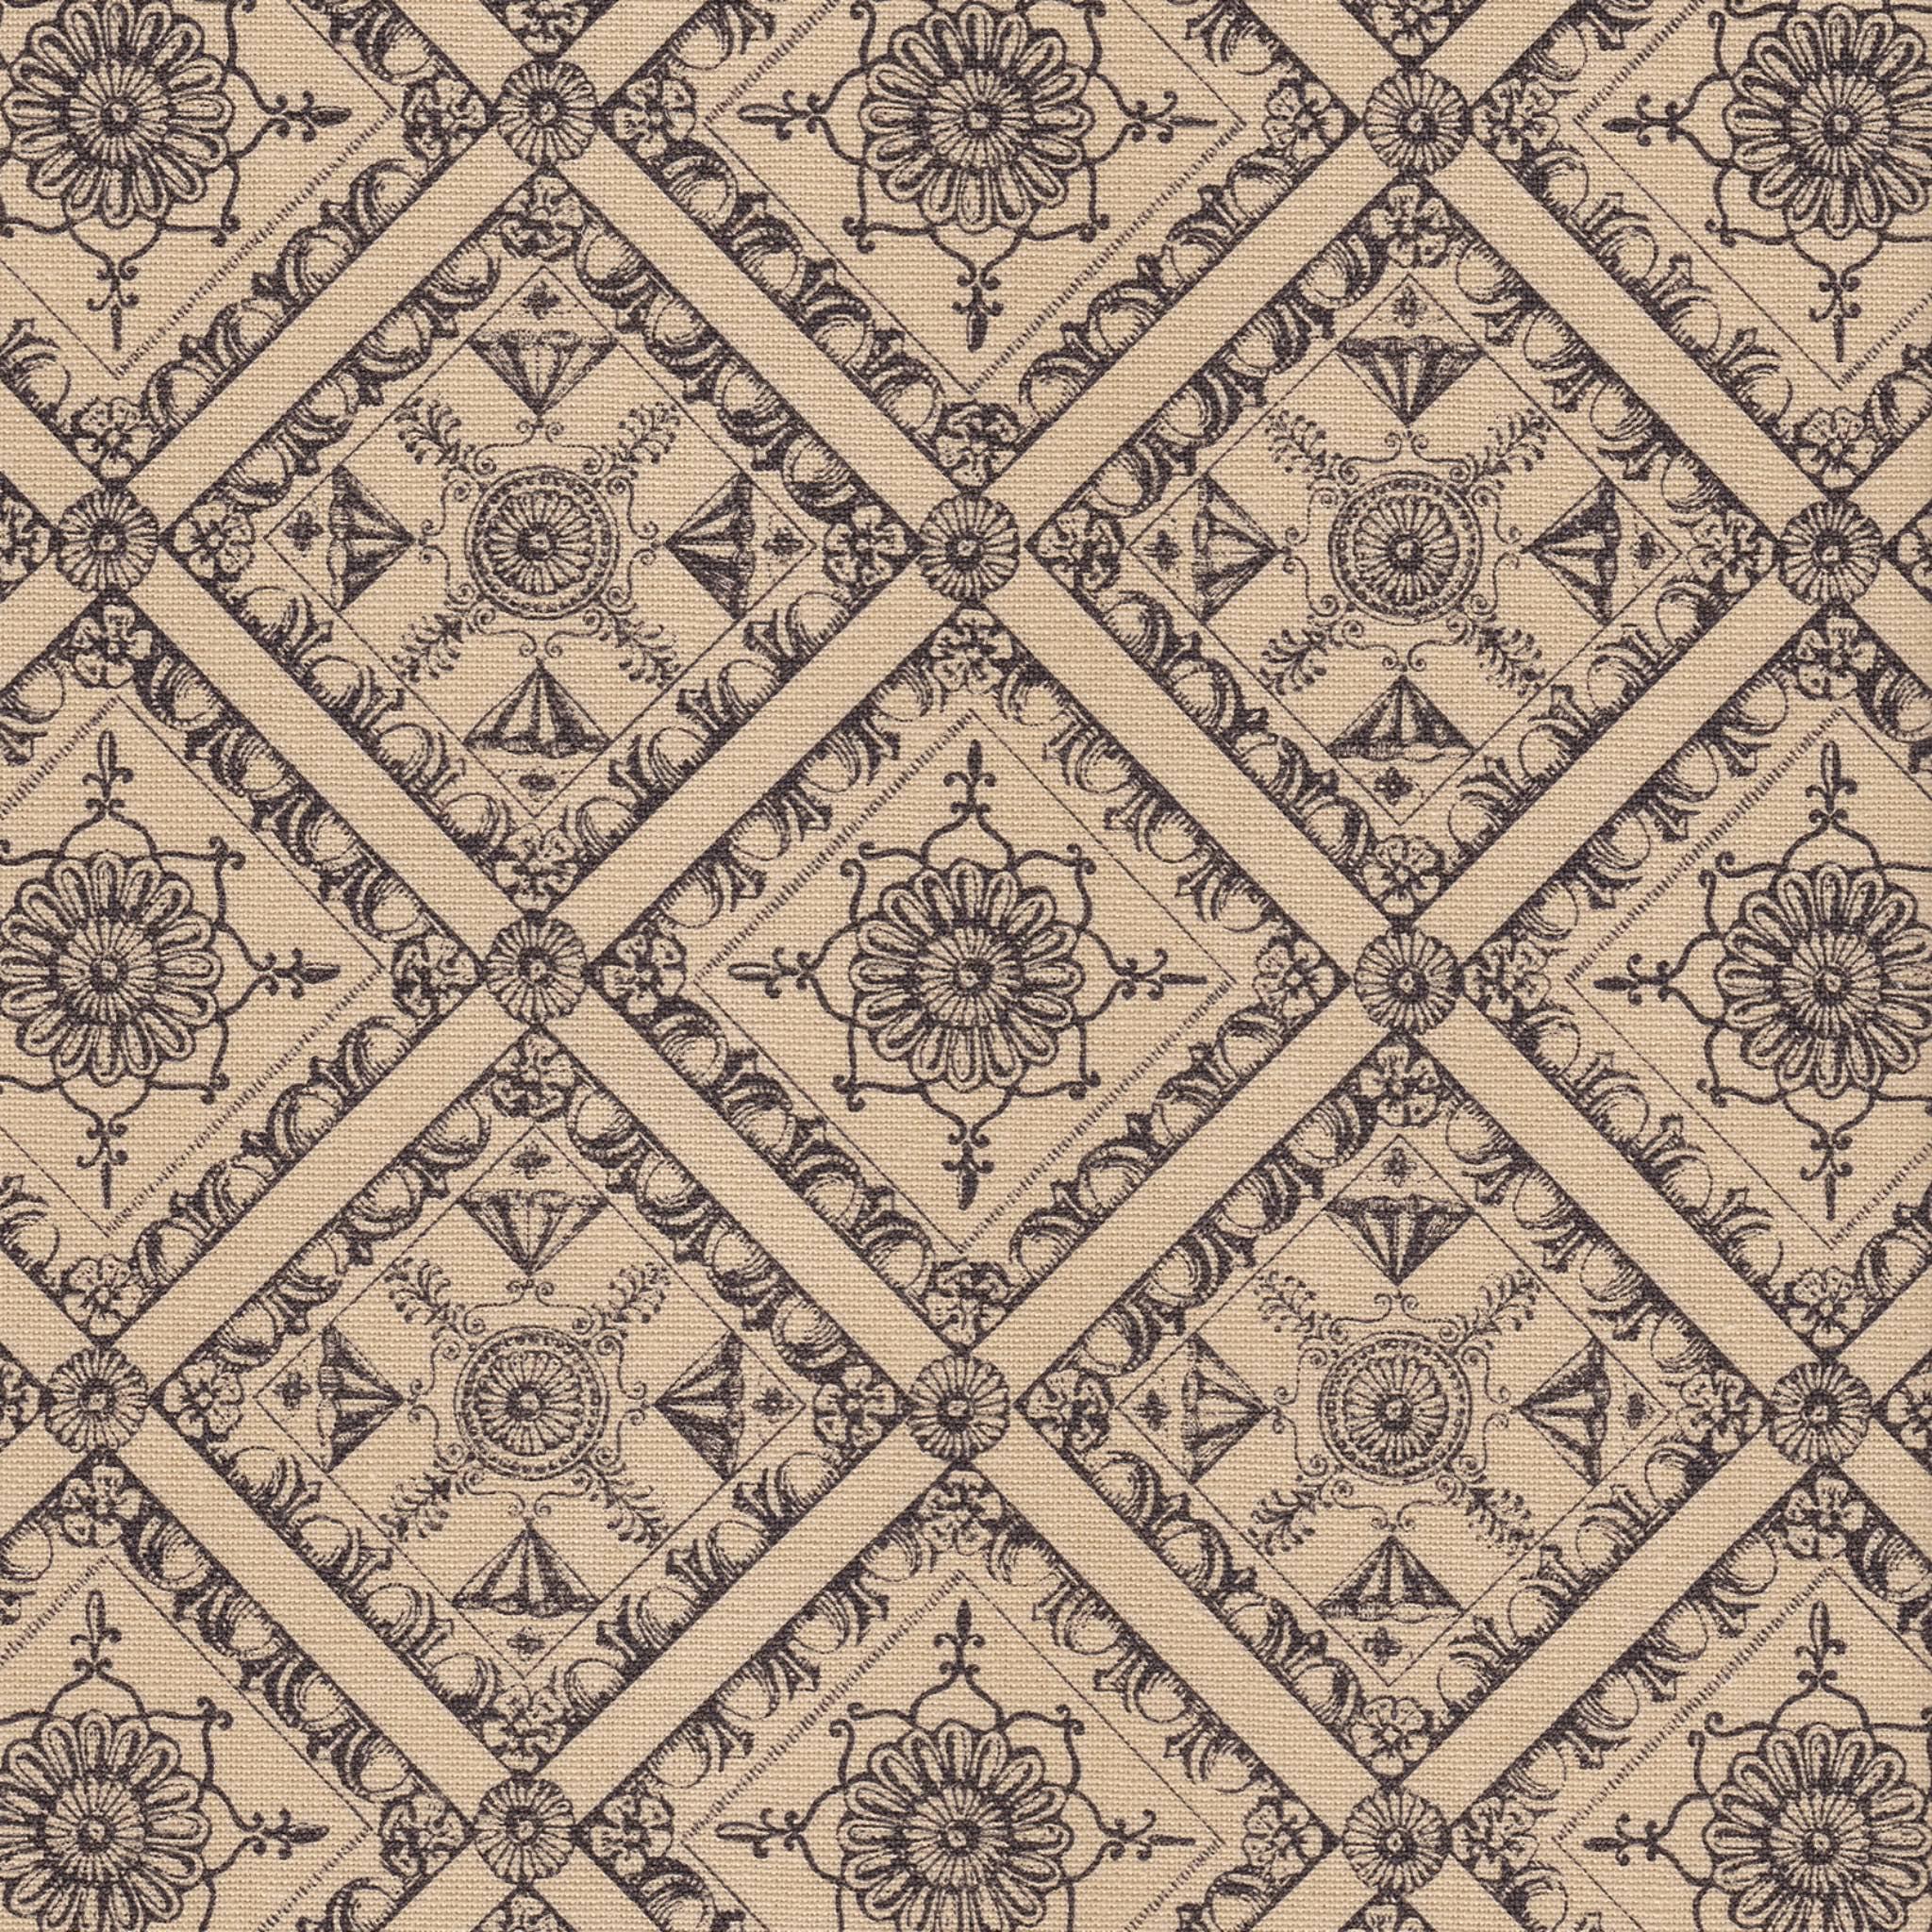 N&Y_Archive Prints_Pergolesi Toile_Charcoal_Swatch_1x1_4.3MB.jpg